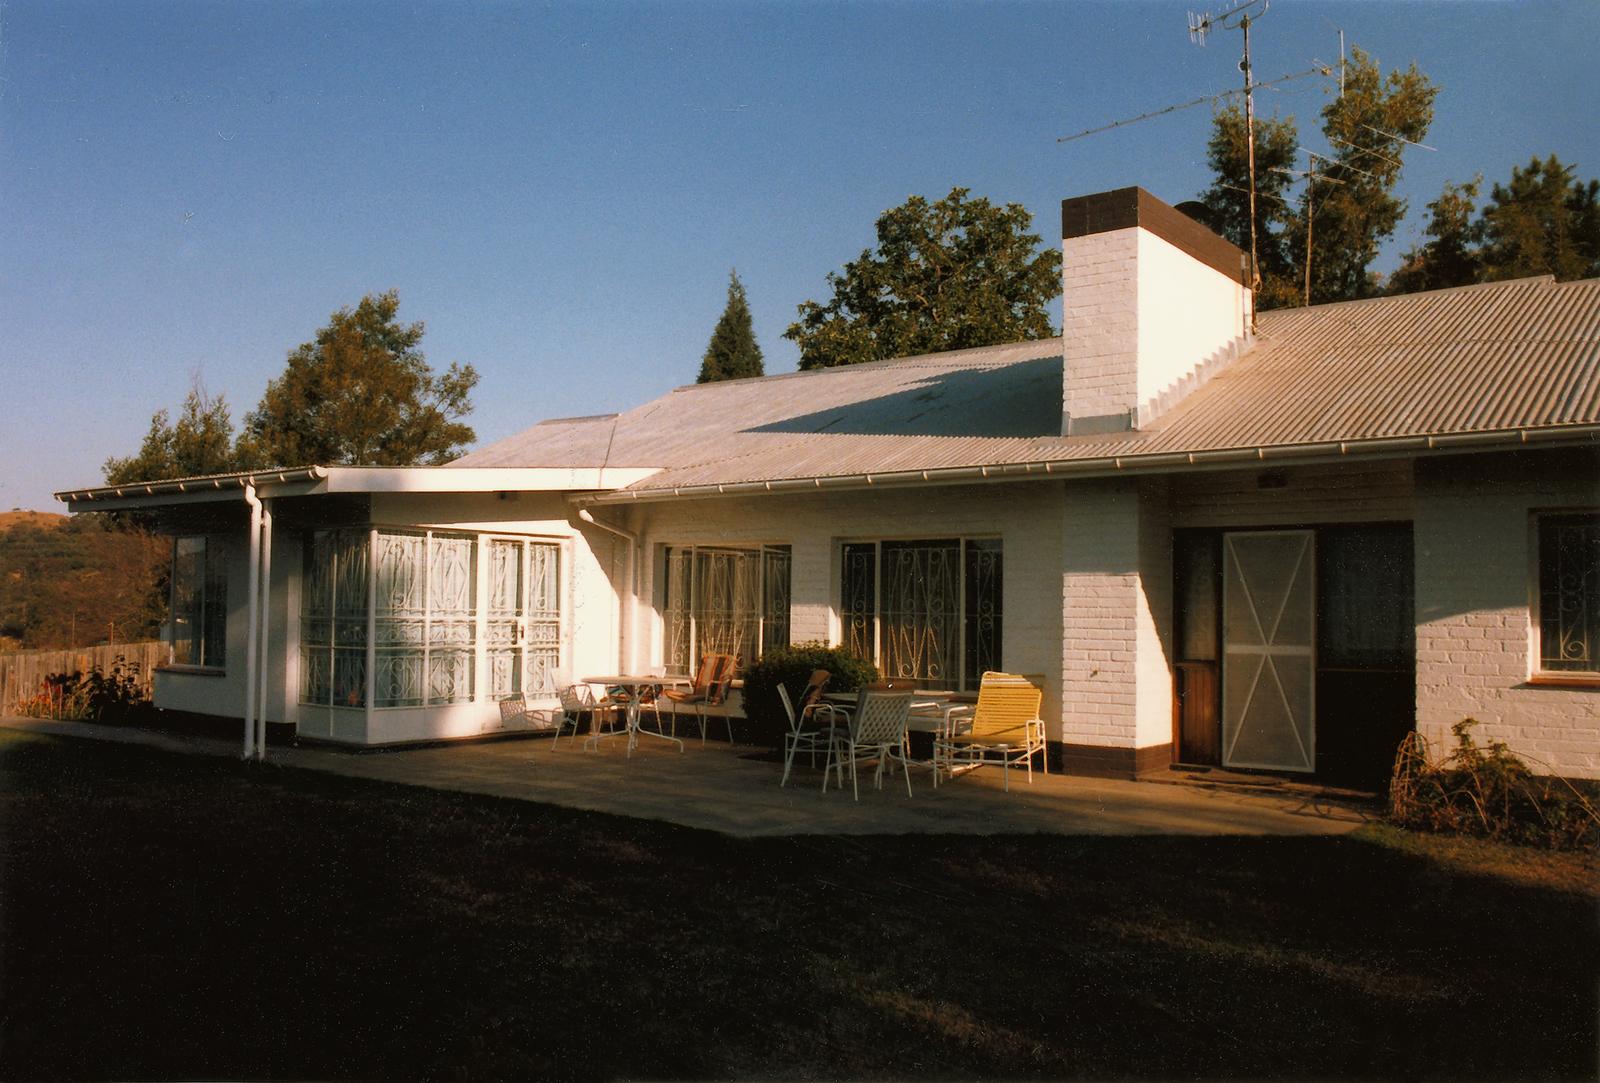 Mbabane - Standard Level Position Residence - 1986